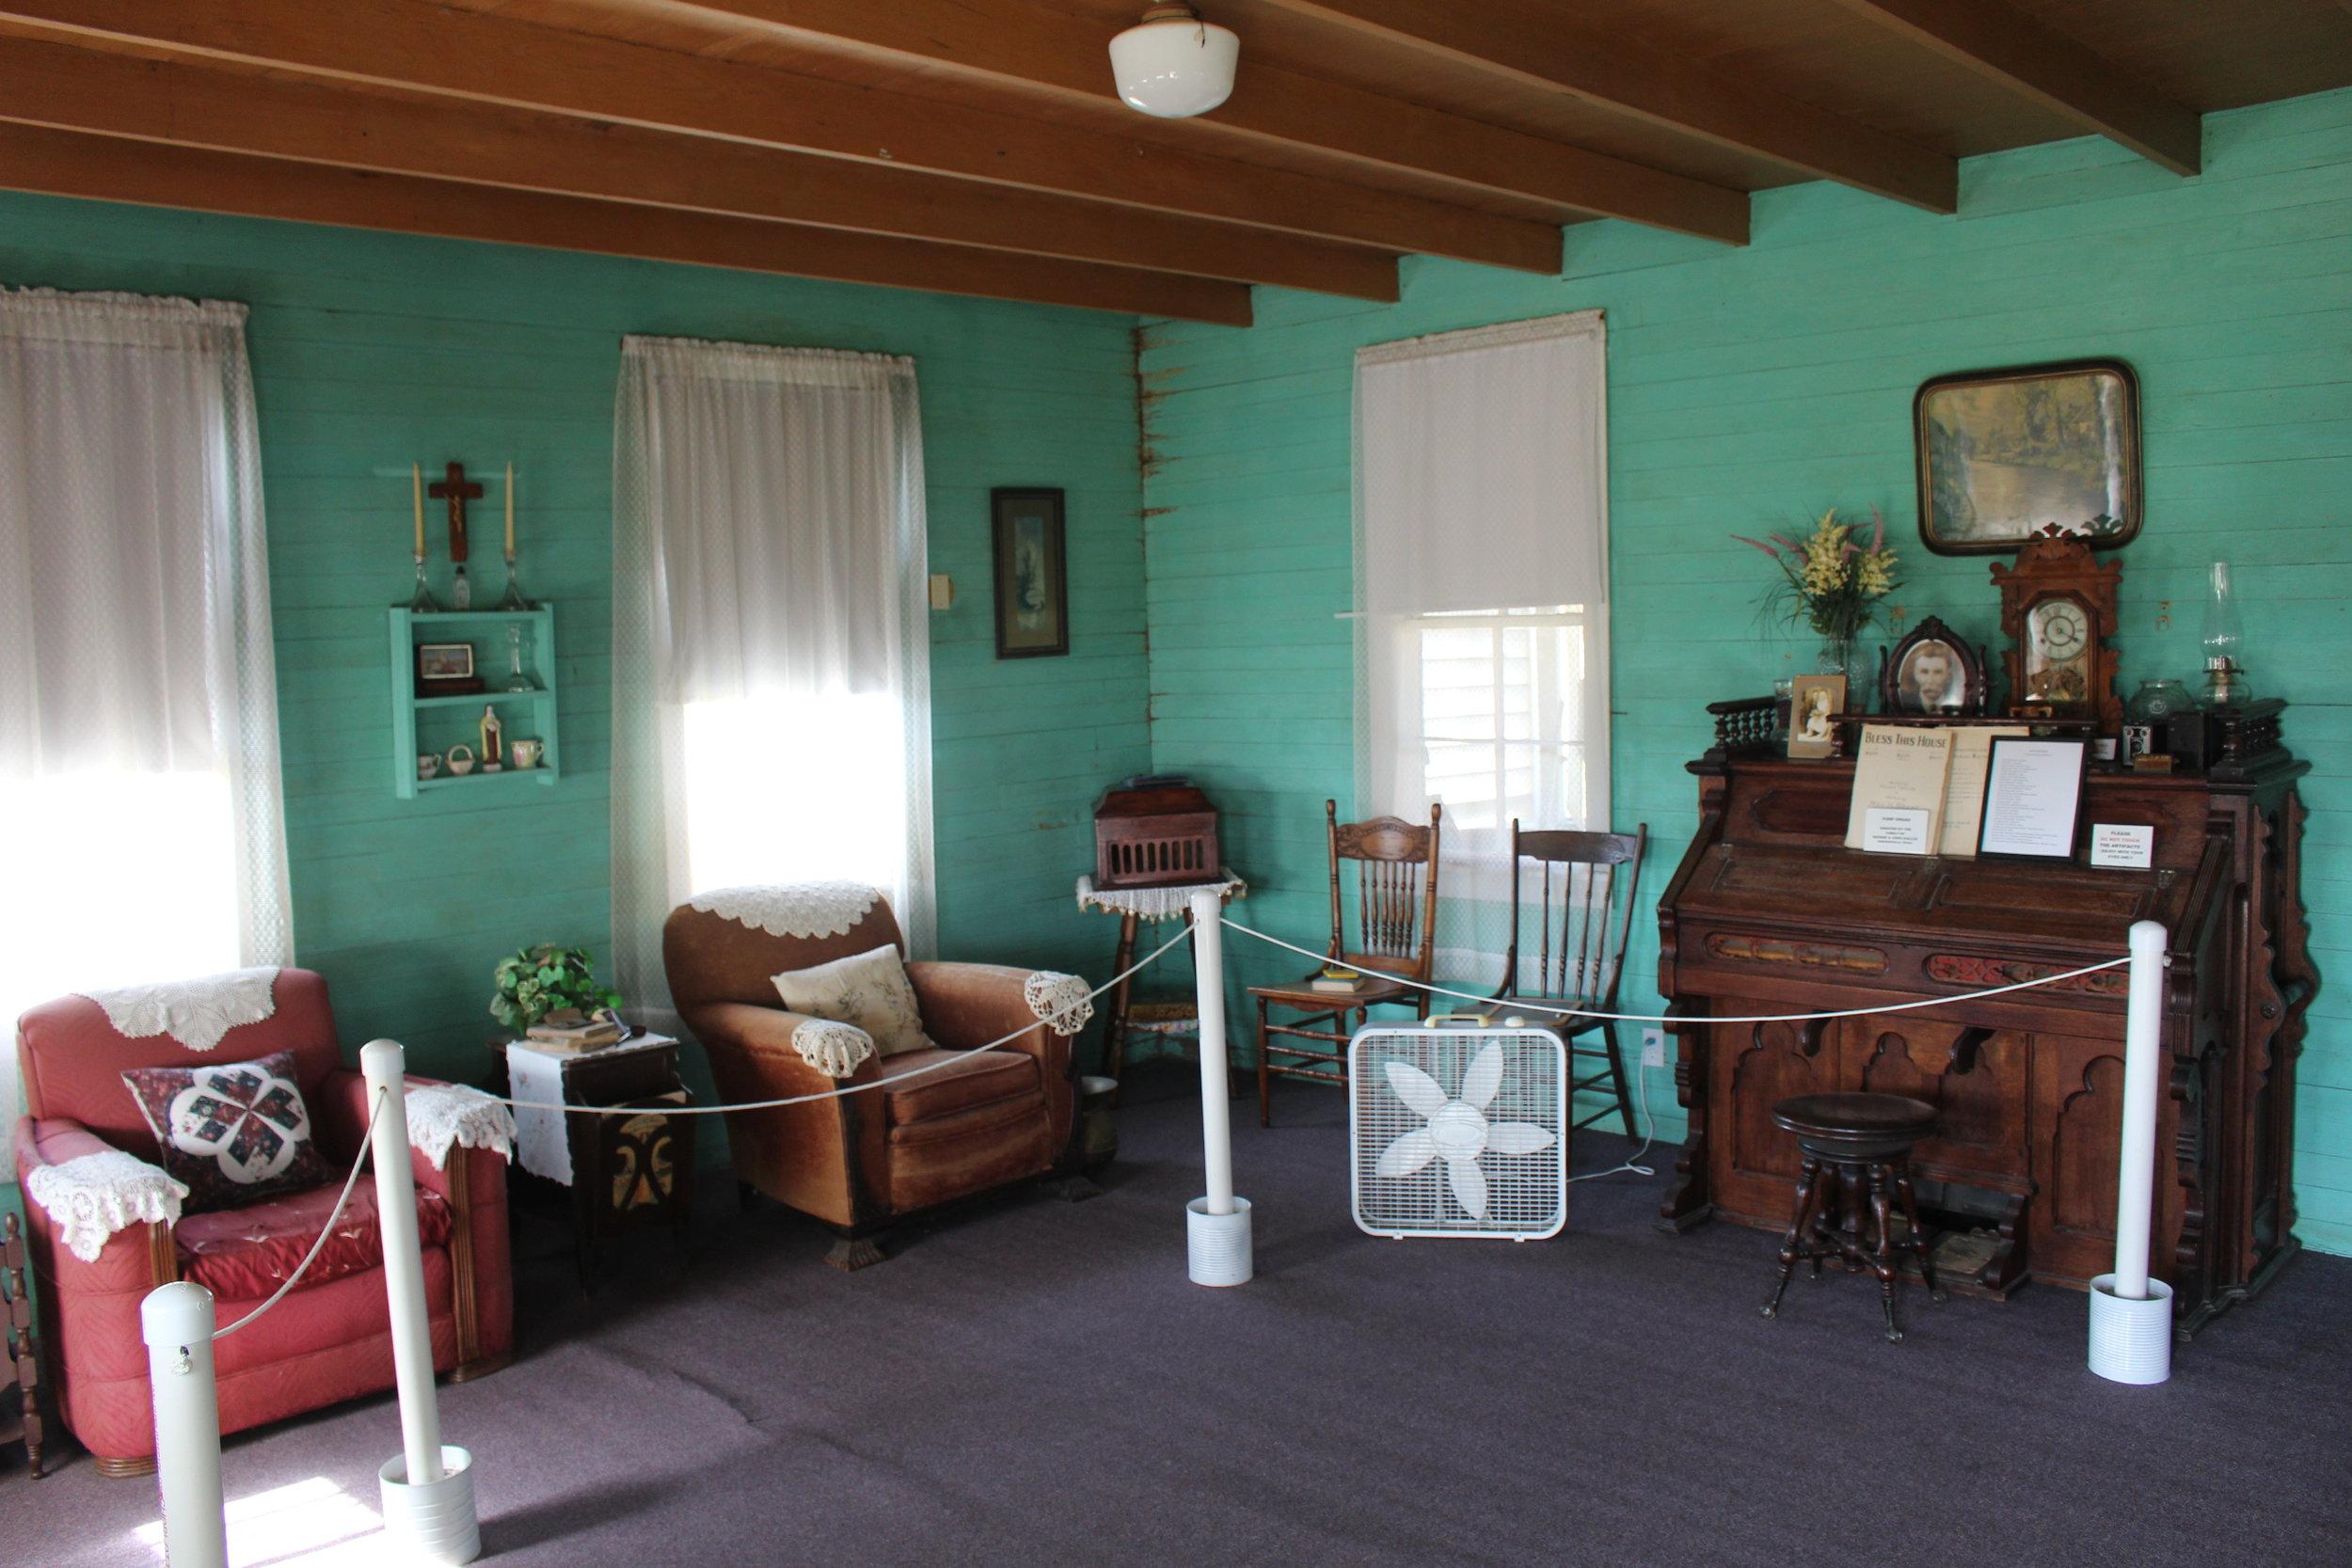 19.Hluchanek-Salas House interior.jpg